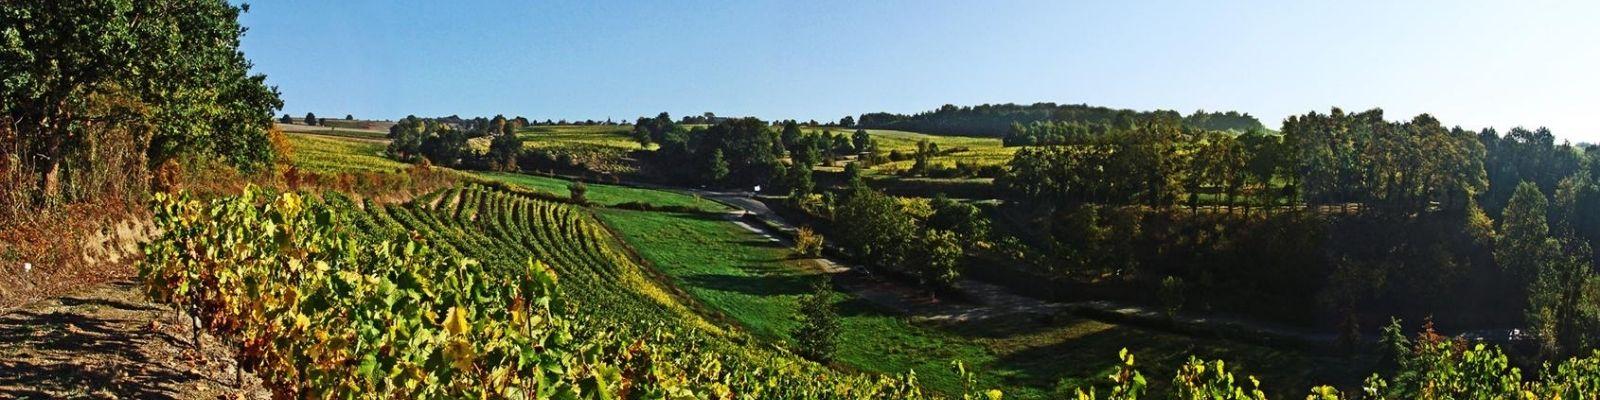 Liore Valley